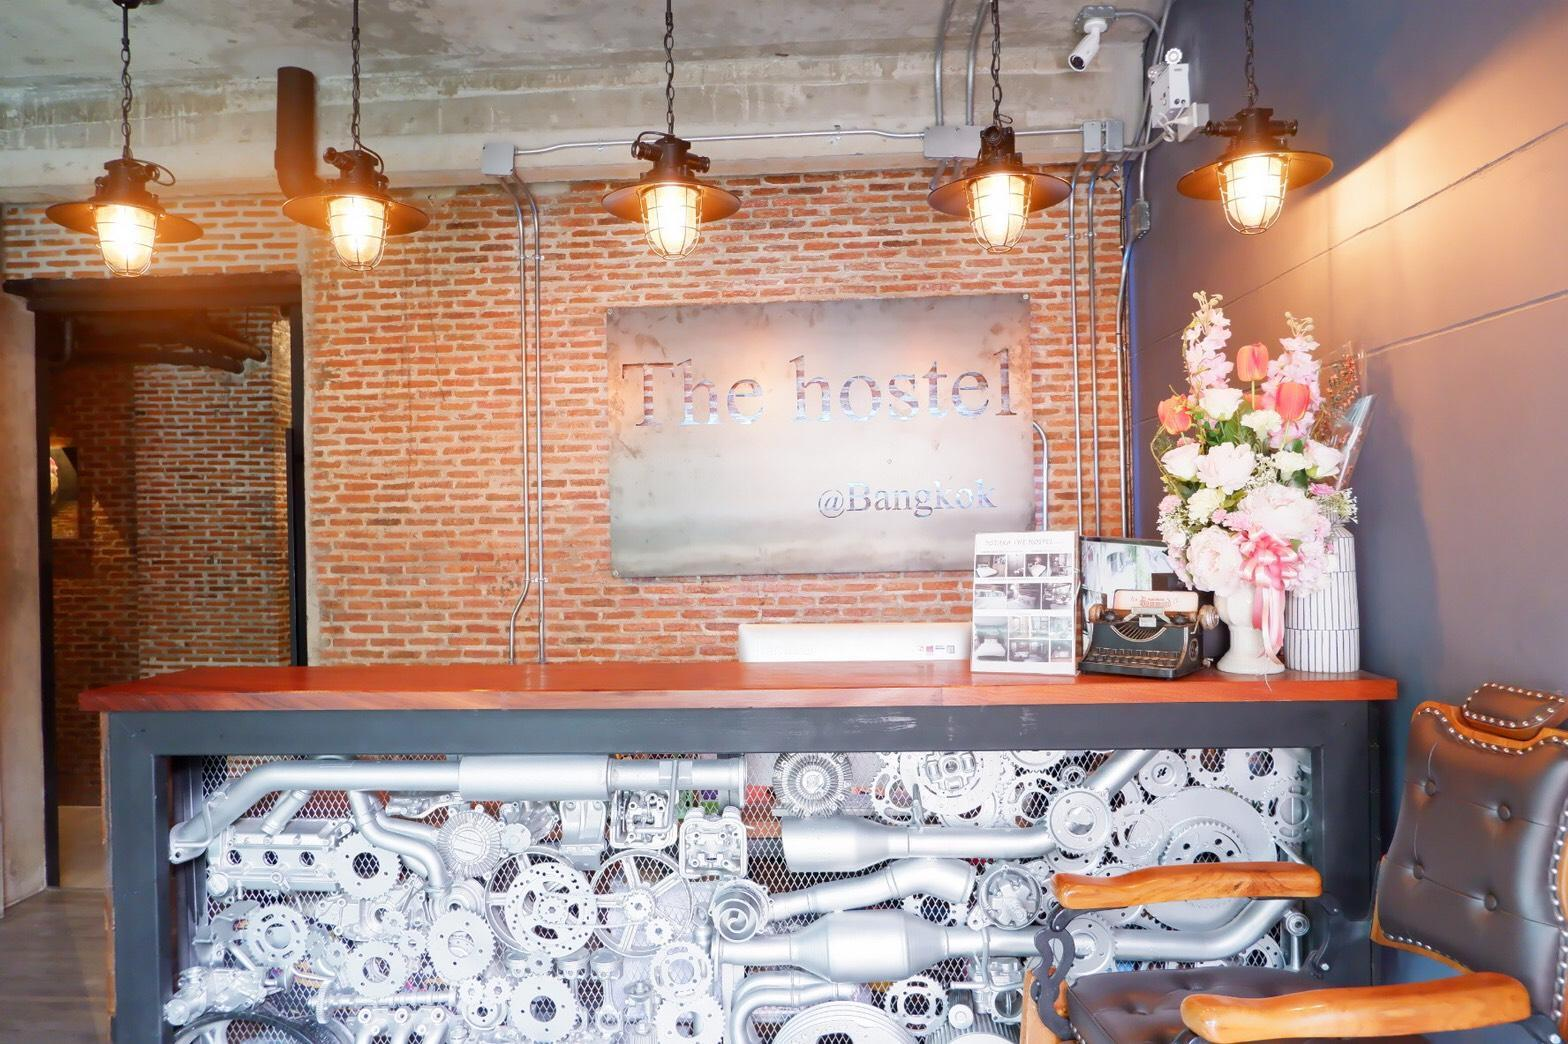 Yotaka The Hostel @Bangkok, Wang Thonglang